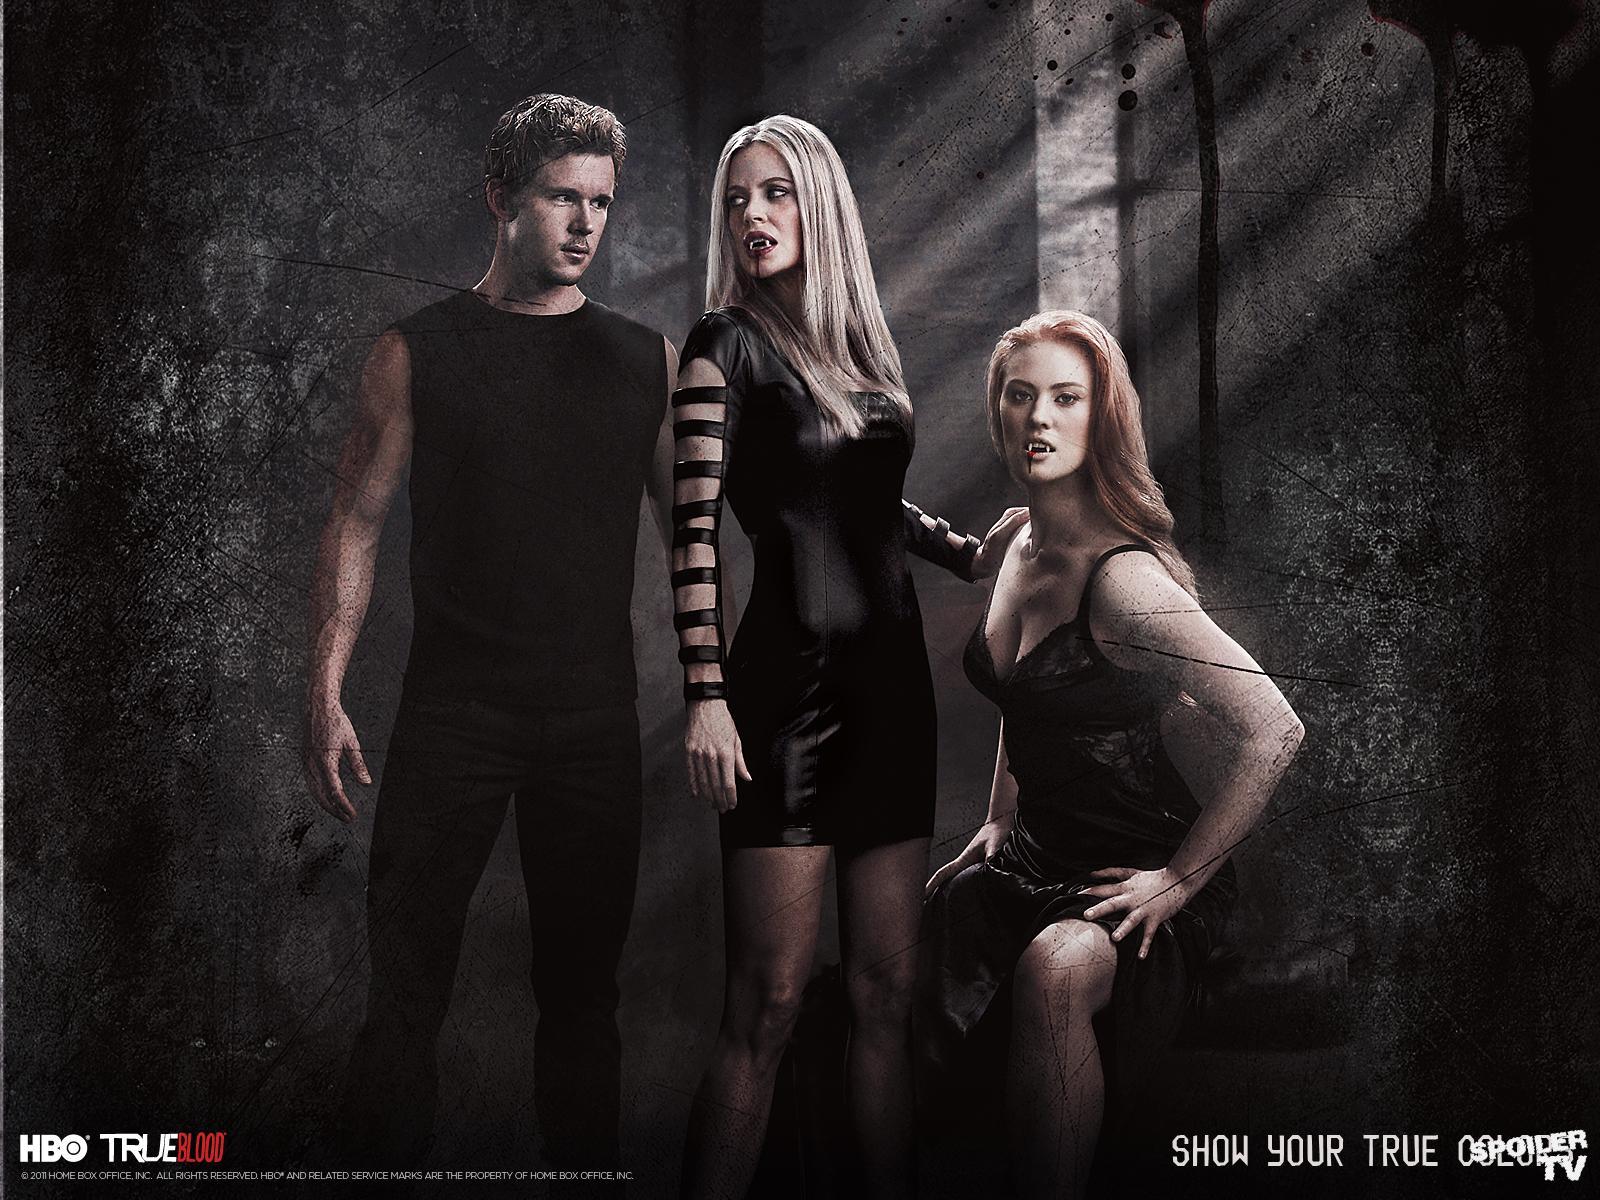 Jessica, Jason, and Pam - True Blood Wallpaper (31532370 ...